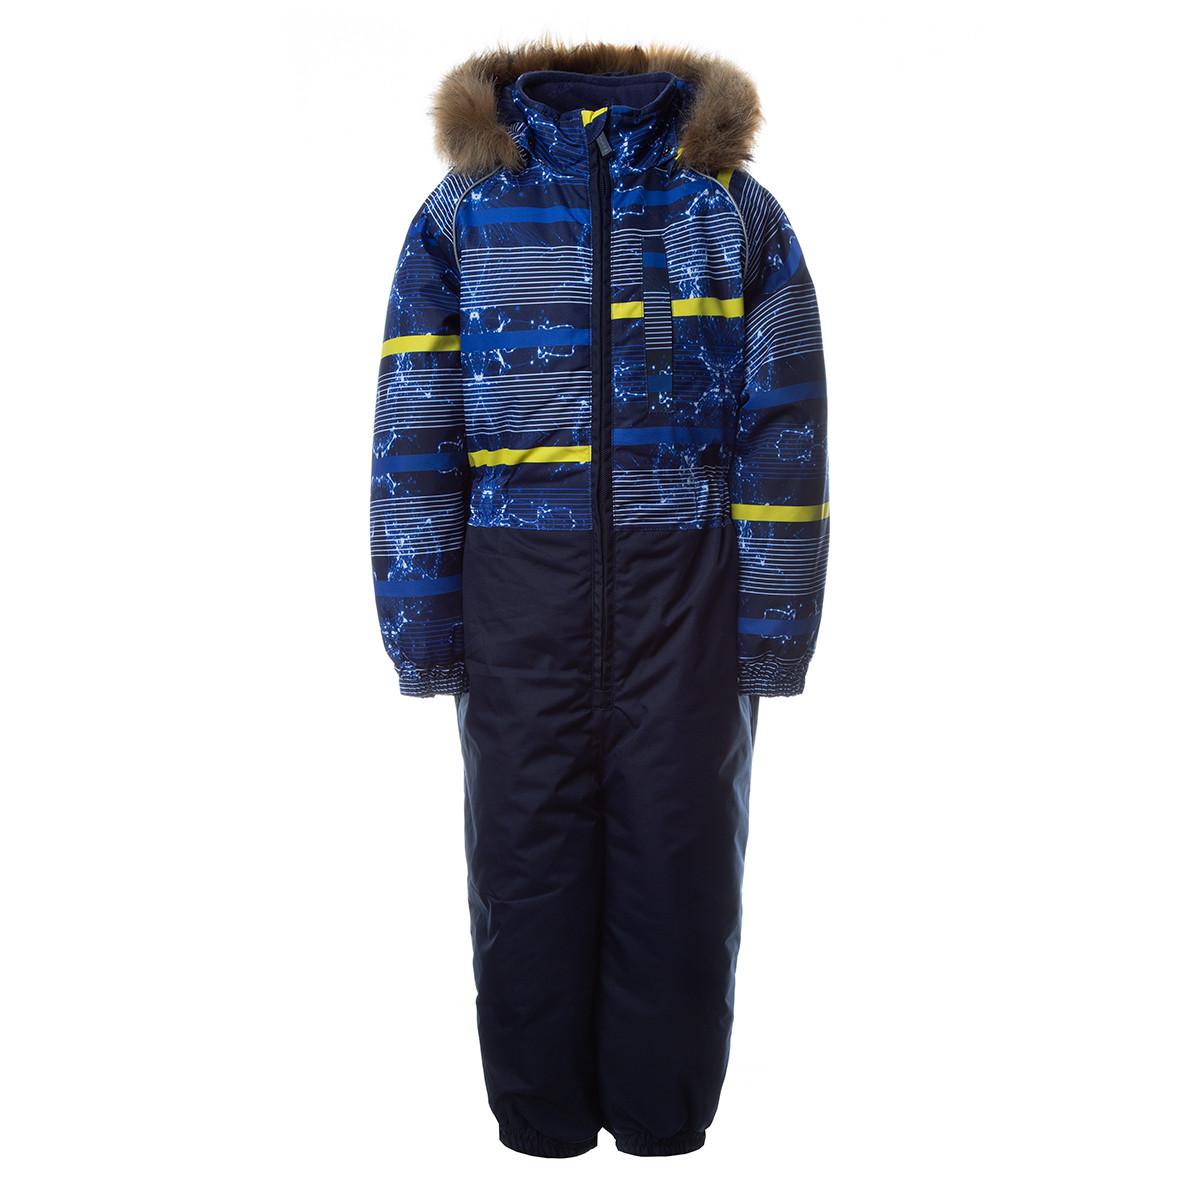 Детский комбинезон Huppa WILLY,  тёмно-синий с принтом/тёмно-синий - 128